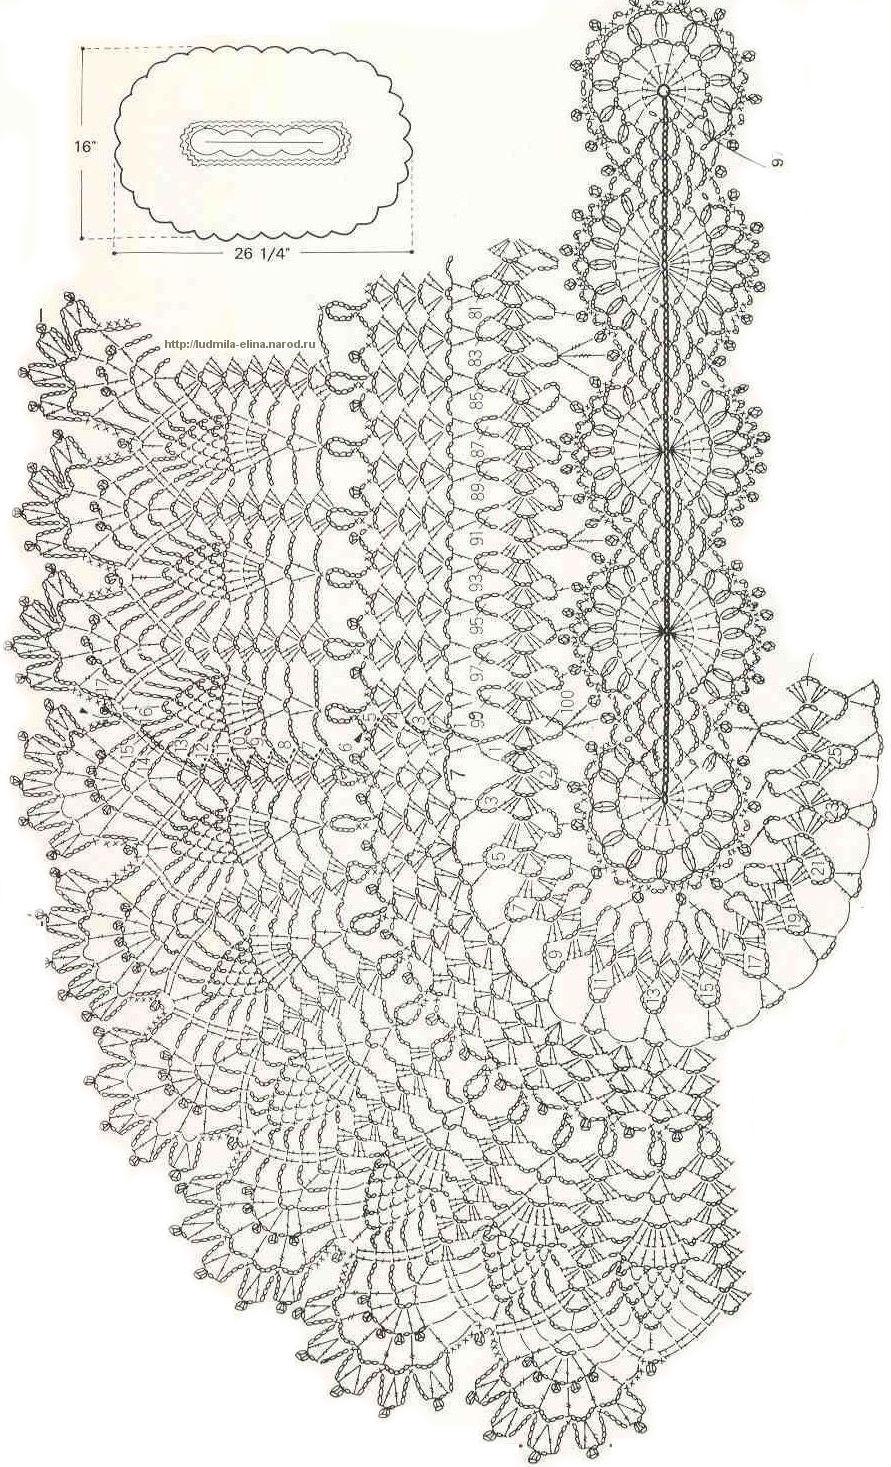 14 сен 2011 ... вязание крючком листика; листья триллистника вязанные крючком схема; вязание крючком длинные листья...